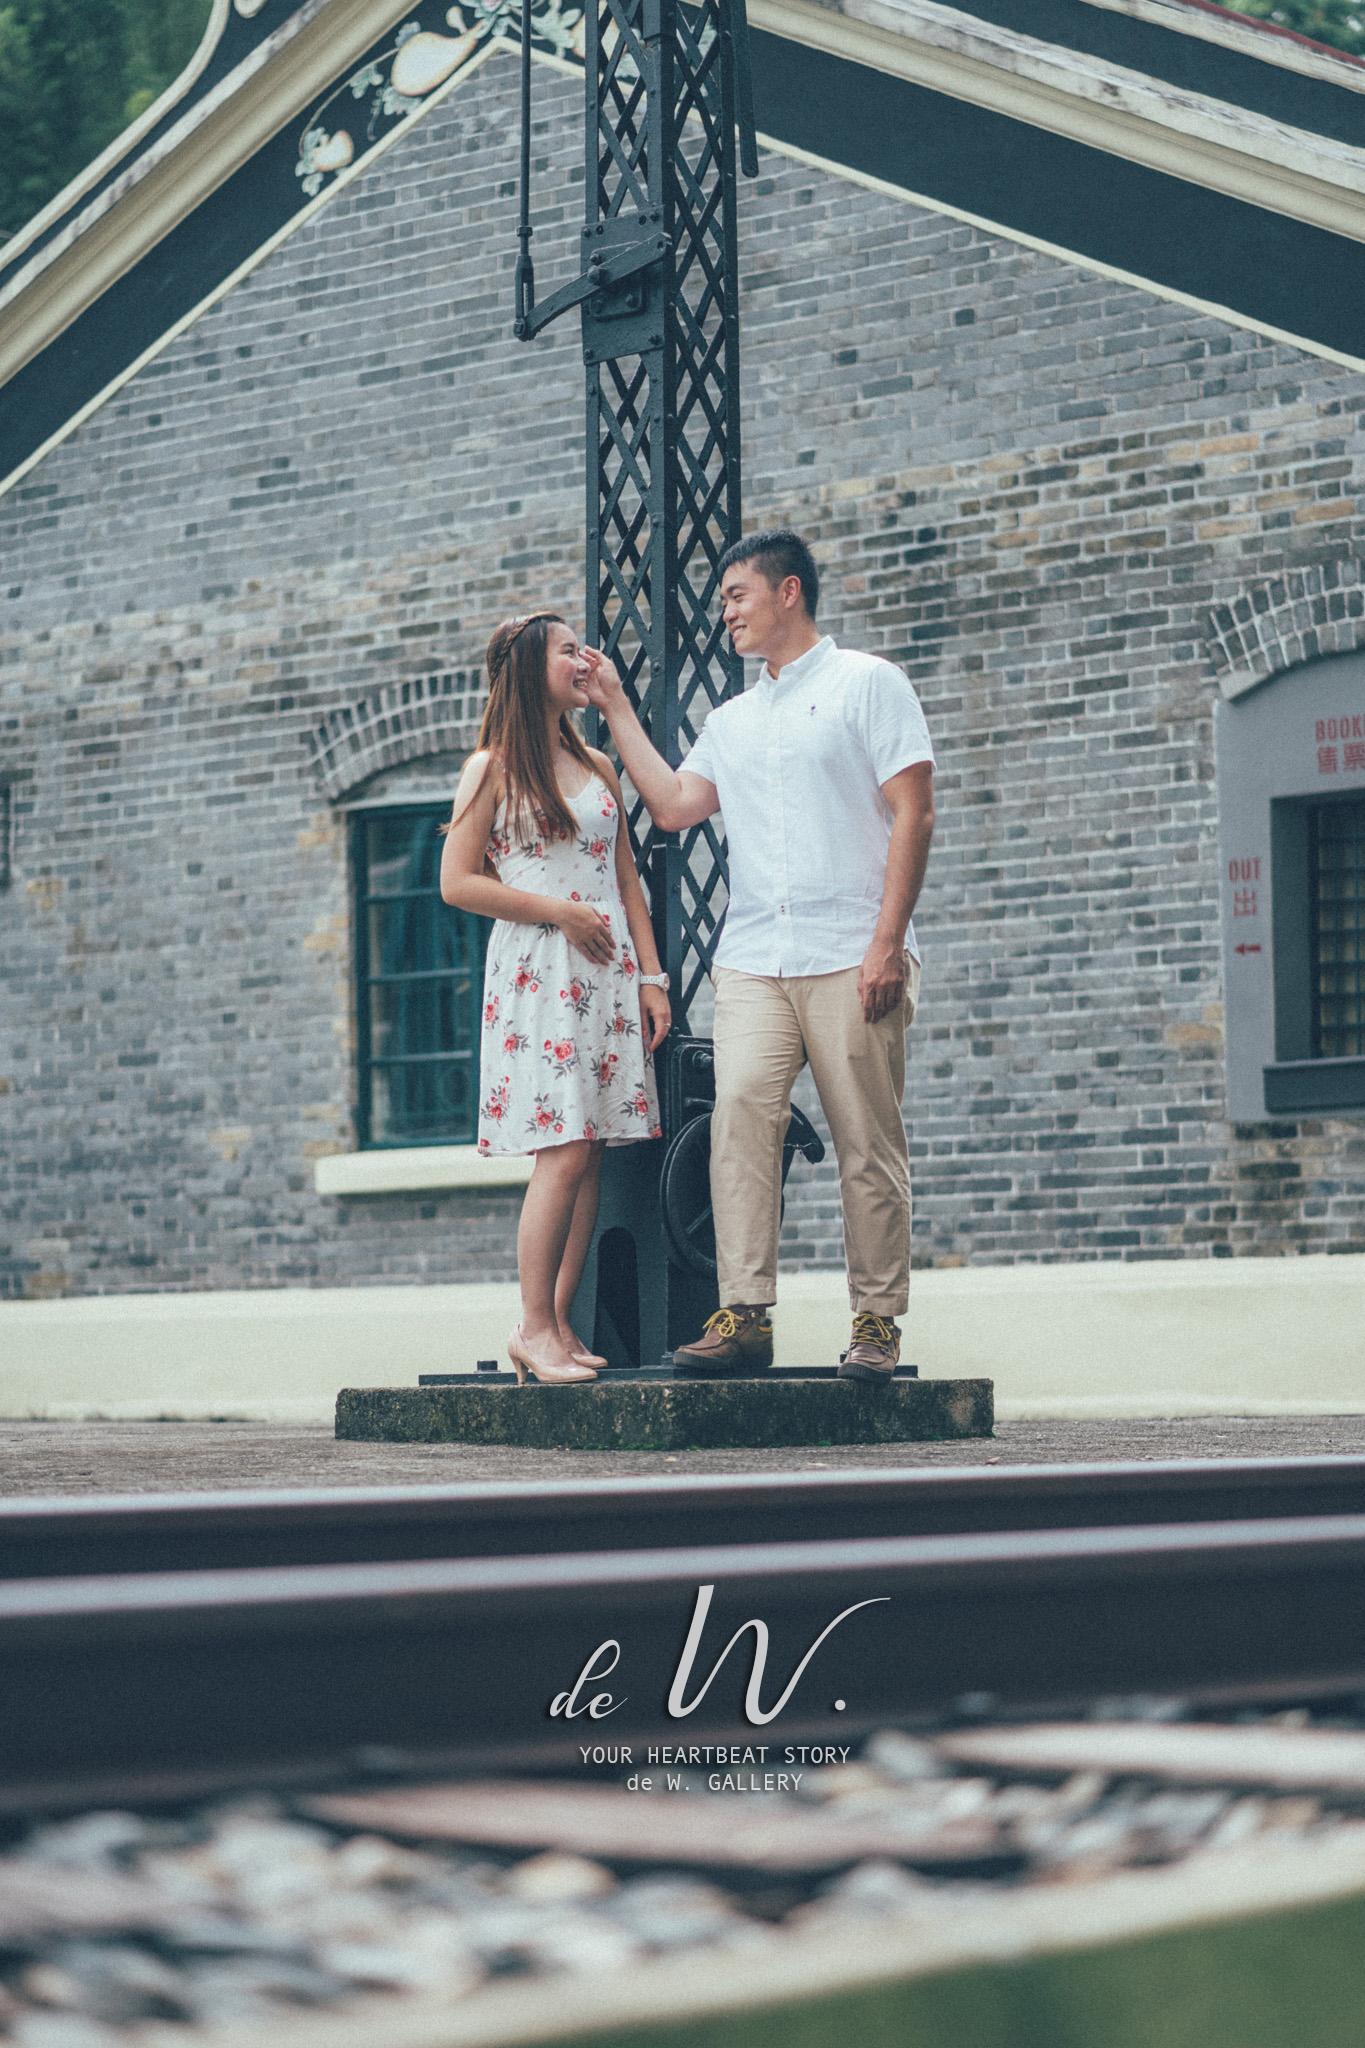 film style story teller de w gallery top10 destination wedding 大埔 火車 2048-038